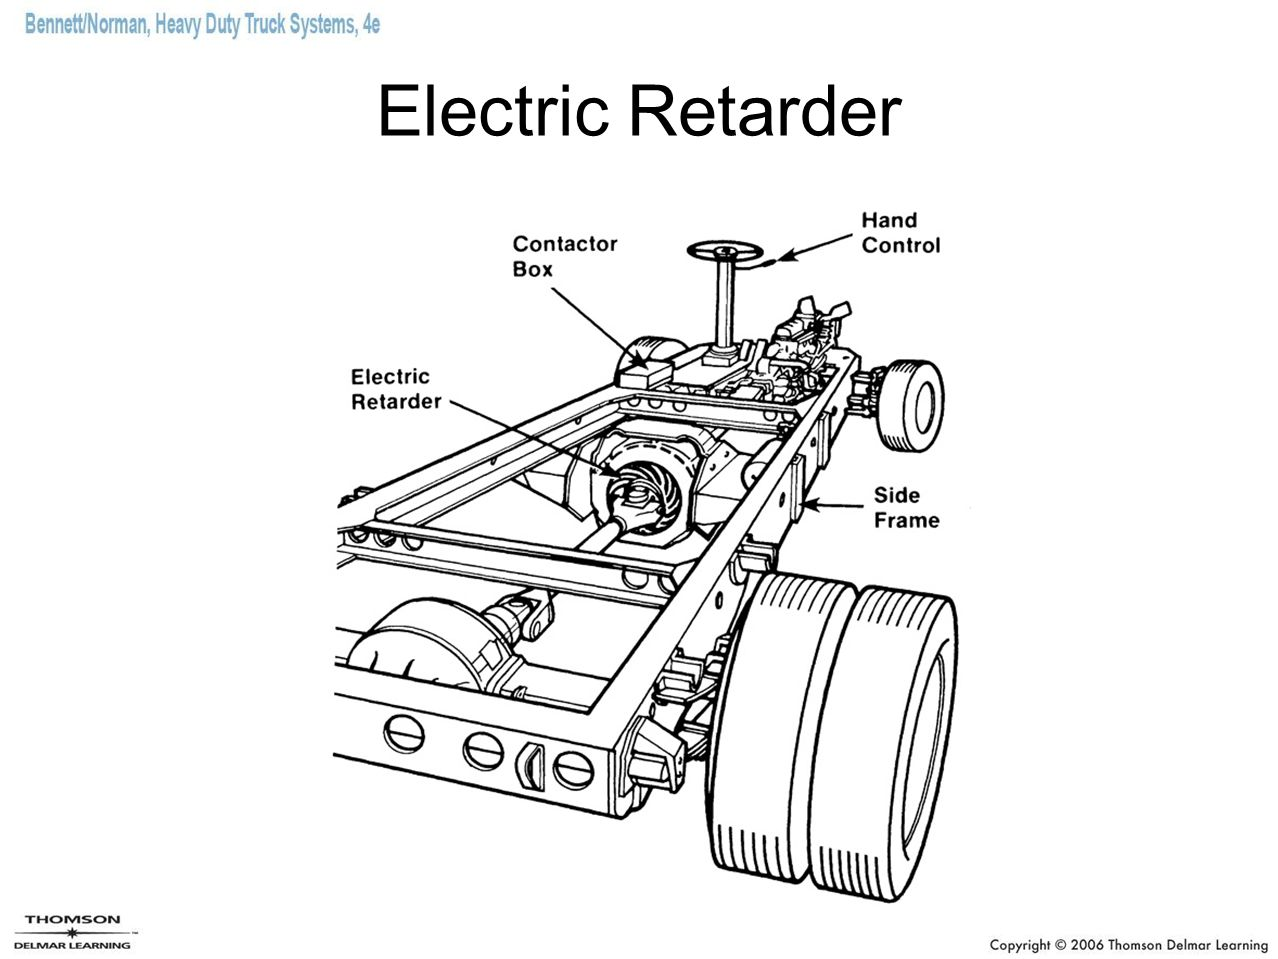 Electric Retarder